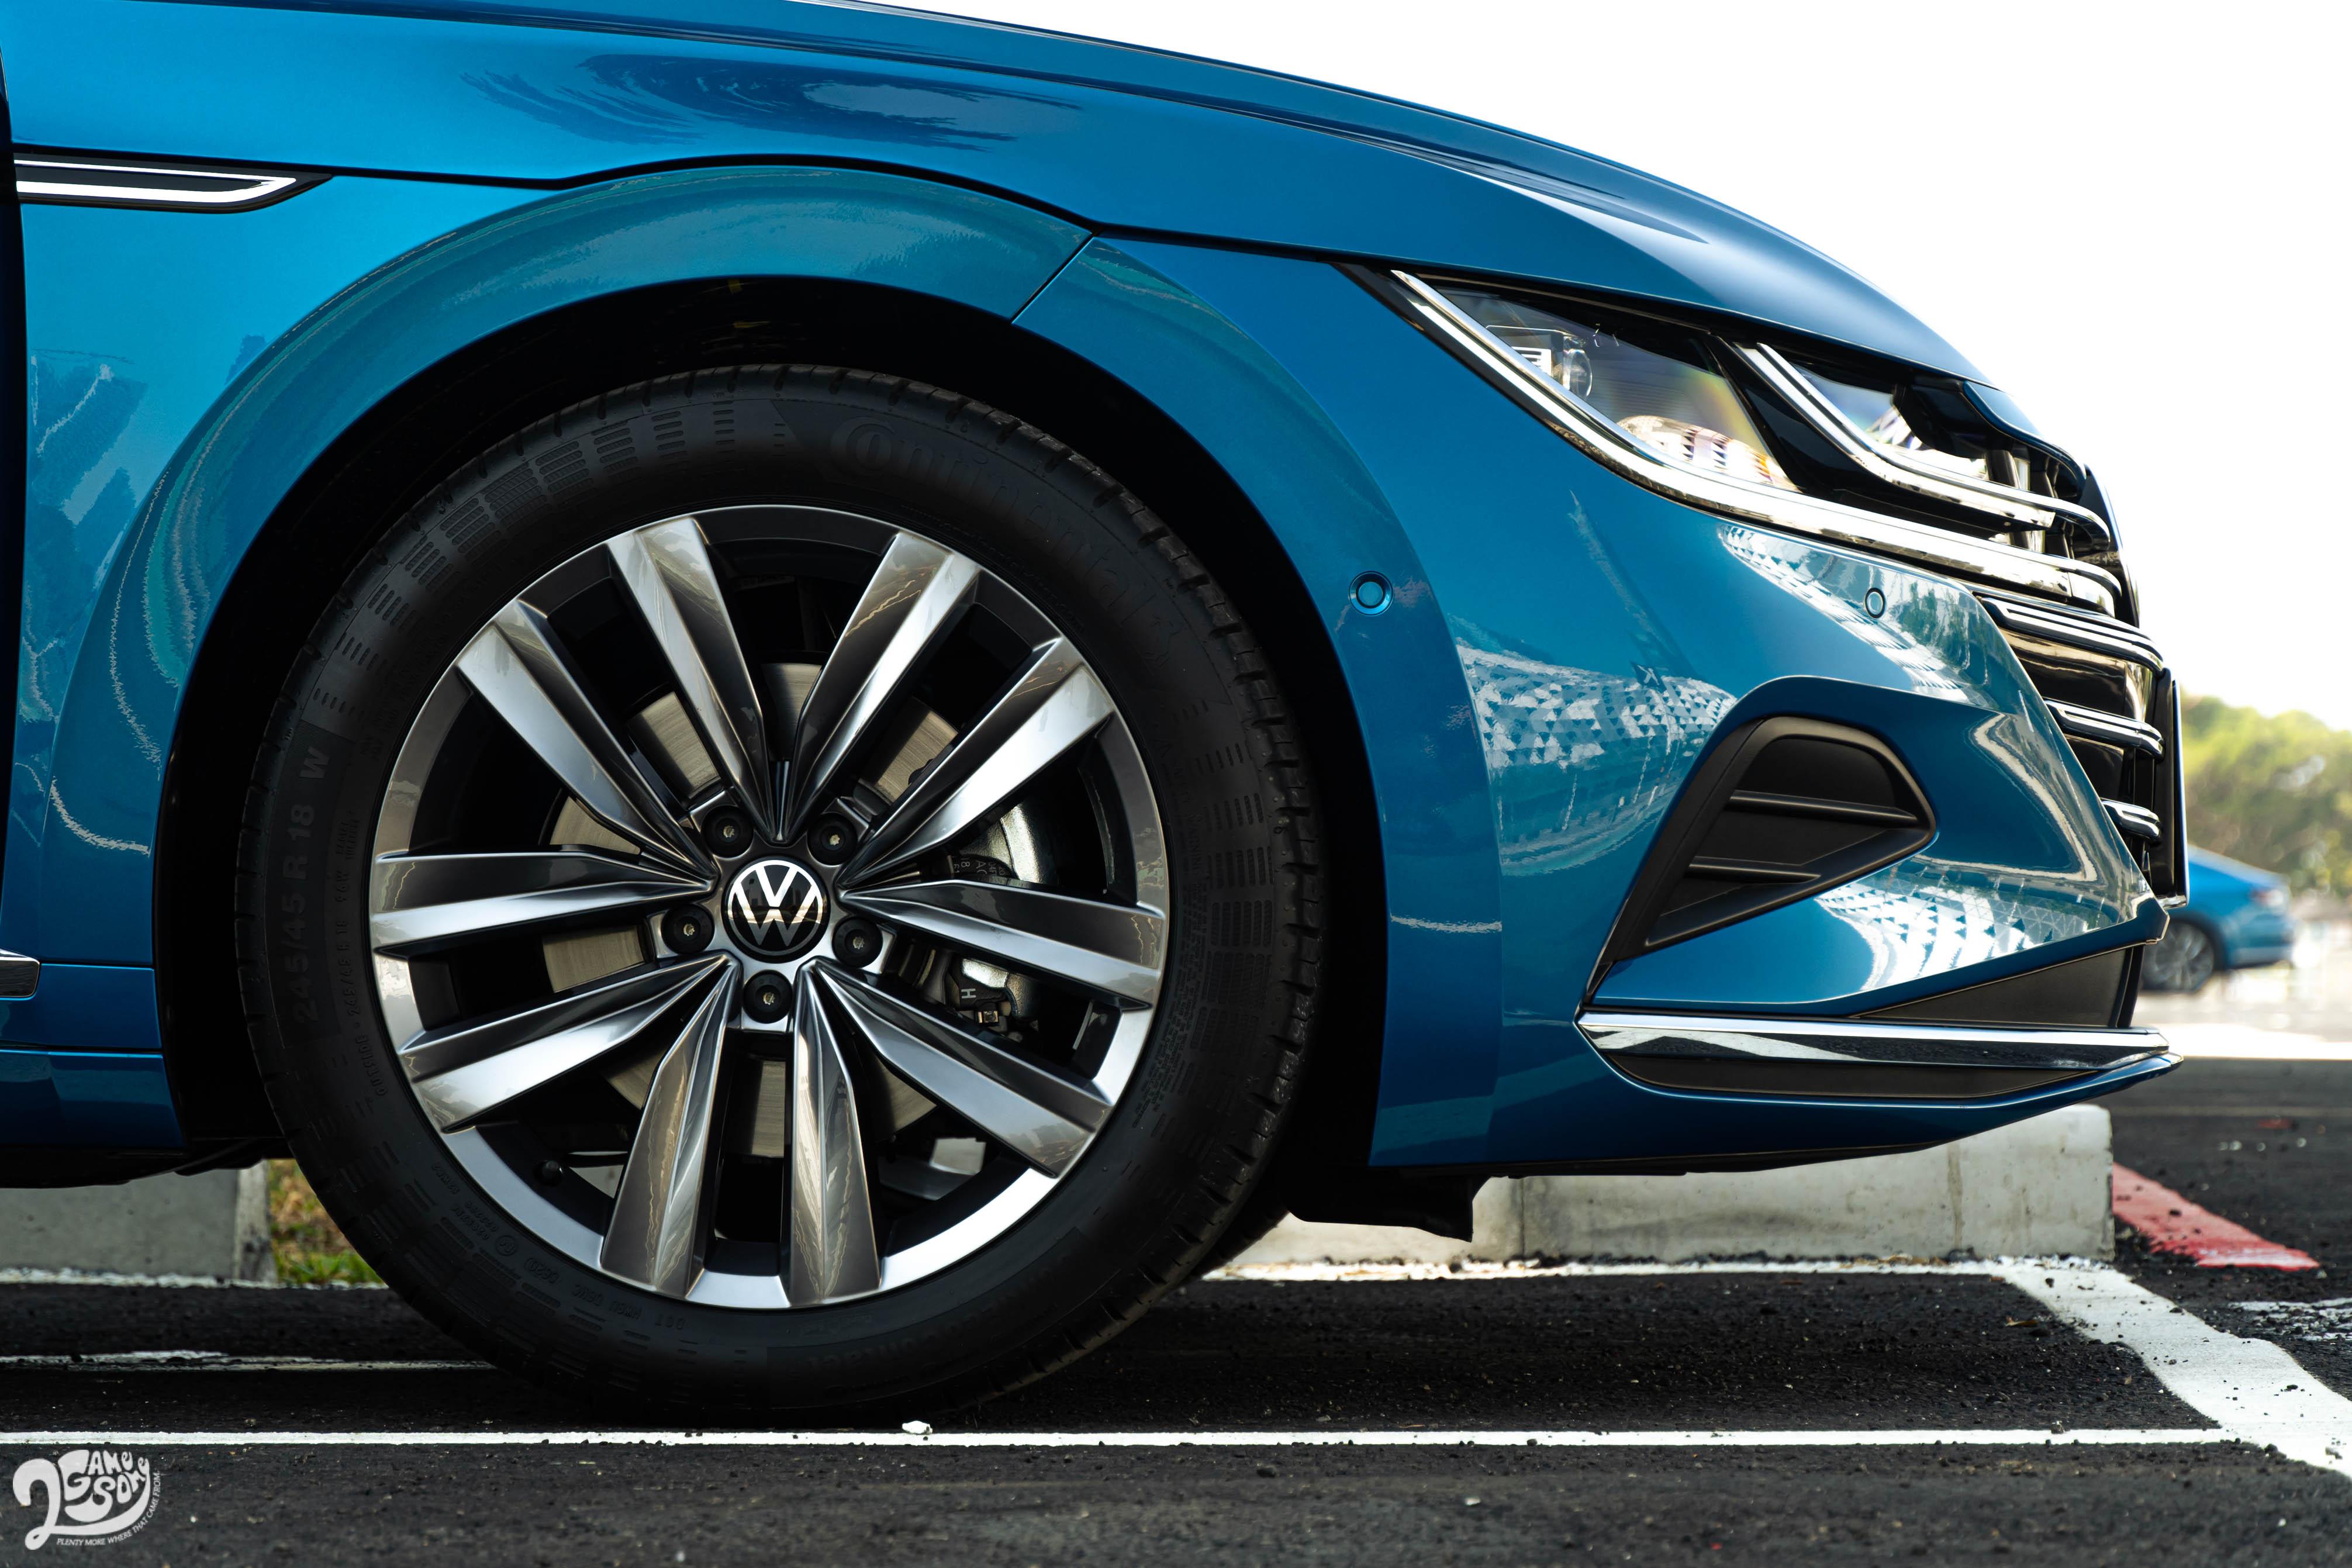 Elegance Premium 車型配備 18 吋輪圈,搭配 245/45R18 輪胎尺碼,並使用動態輪圈中心蓋,讓廠徽始終維持正向。